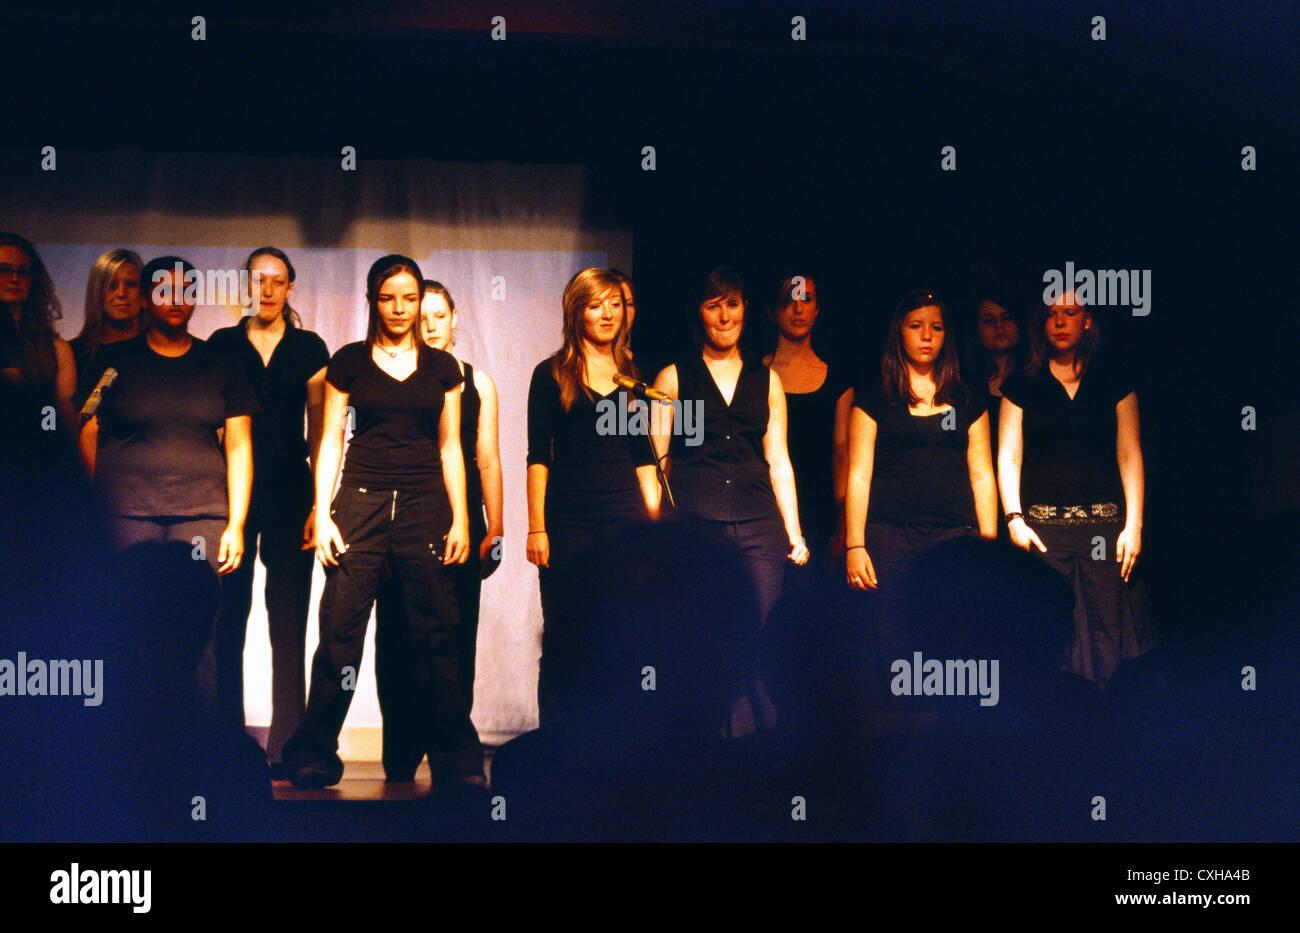 Chor Stockfotos & Chor Bilder - Alamy